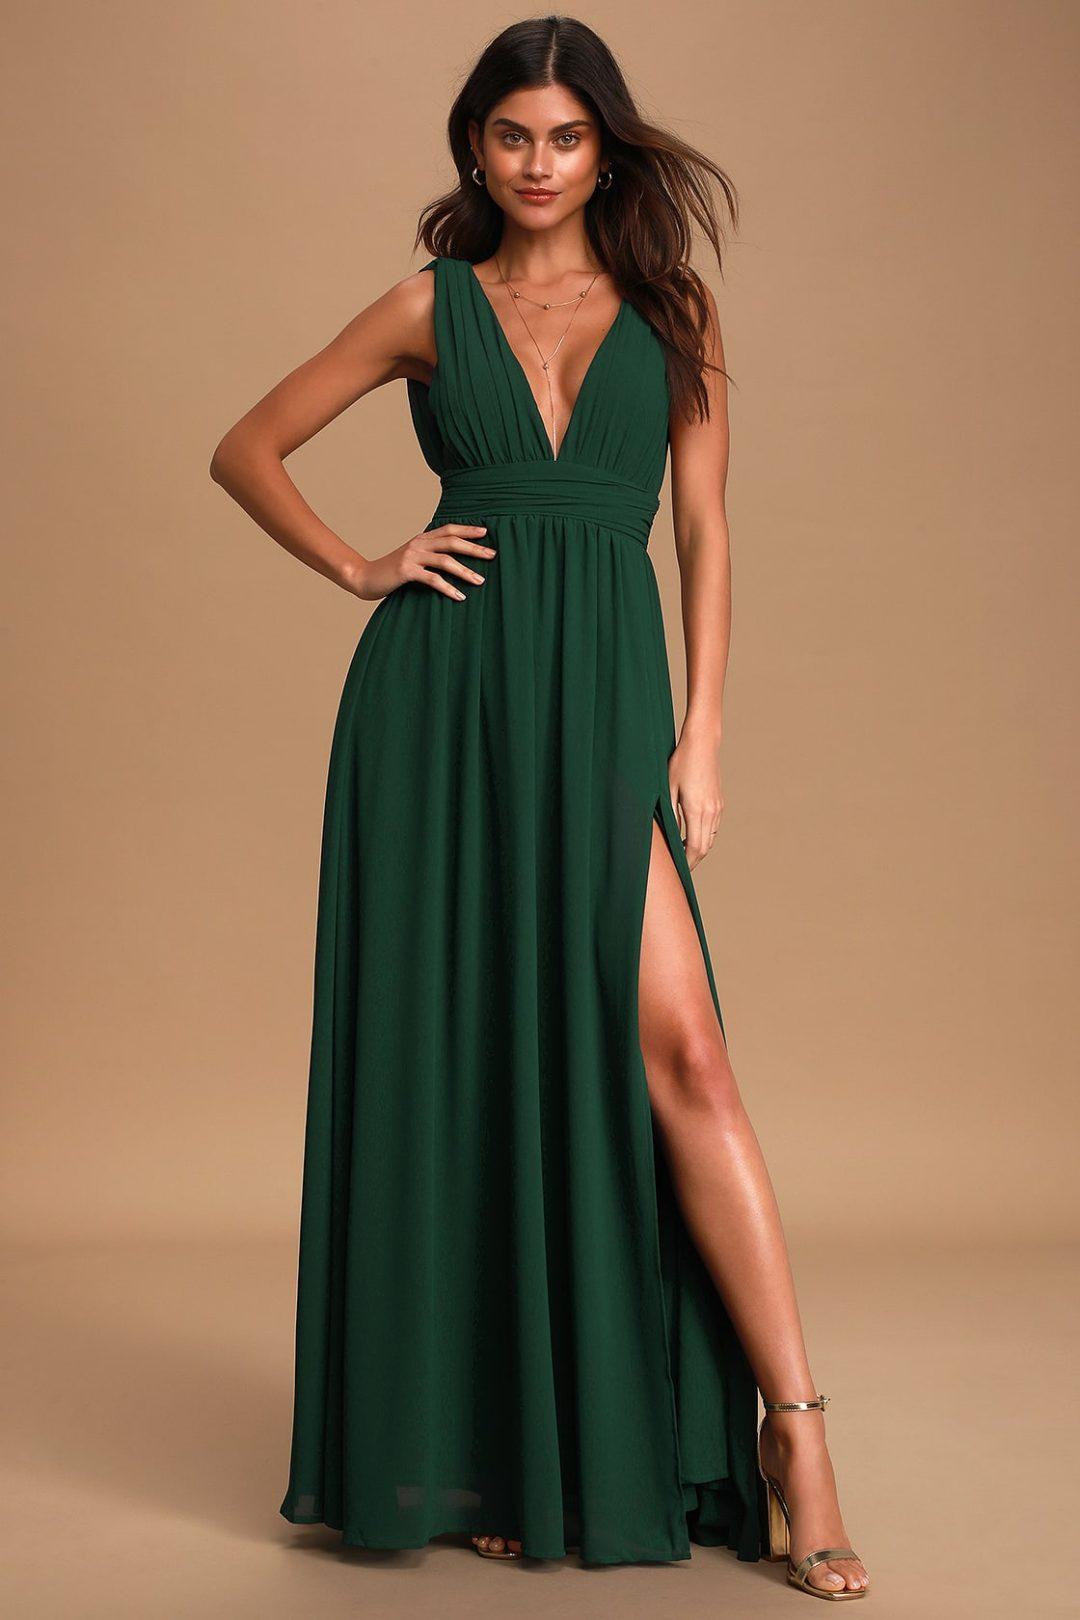 Forest green nursing dress for breastfeeding wedding guest